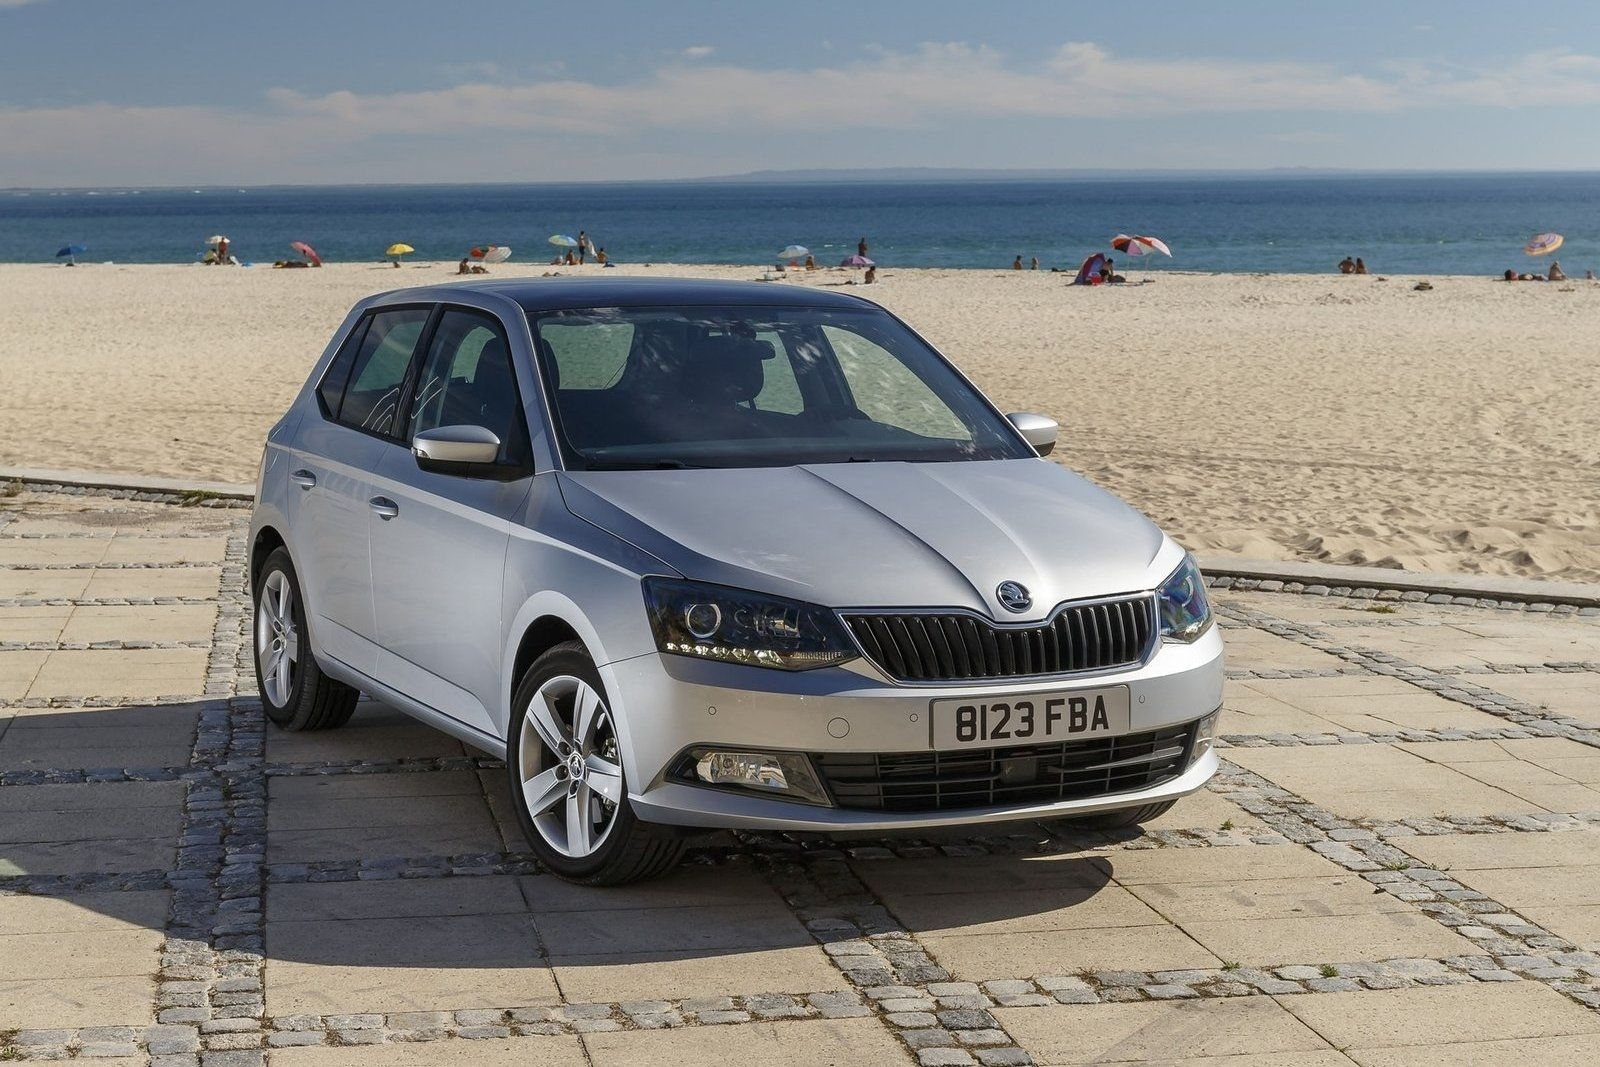 Названы 5 самых безопасных авто 2014 года